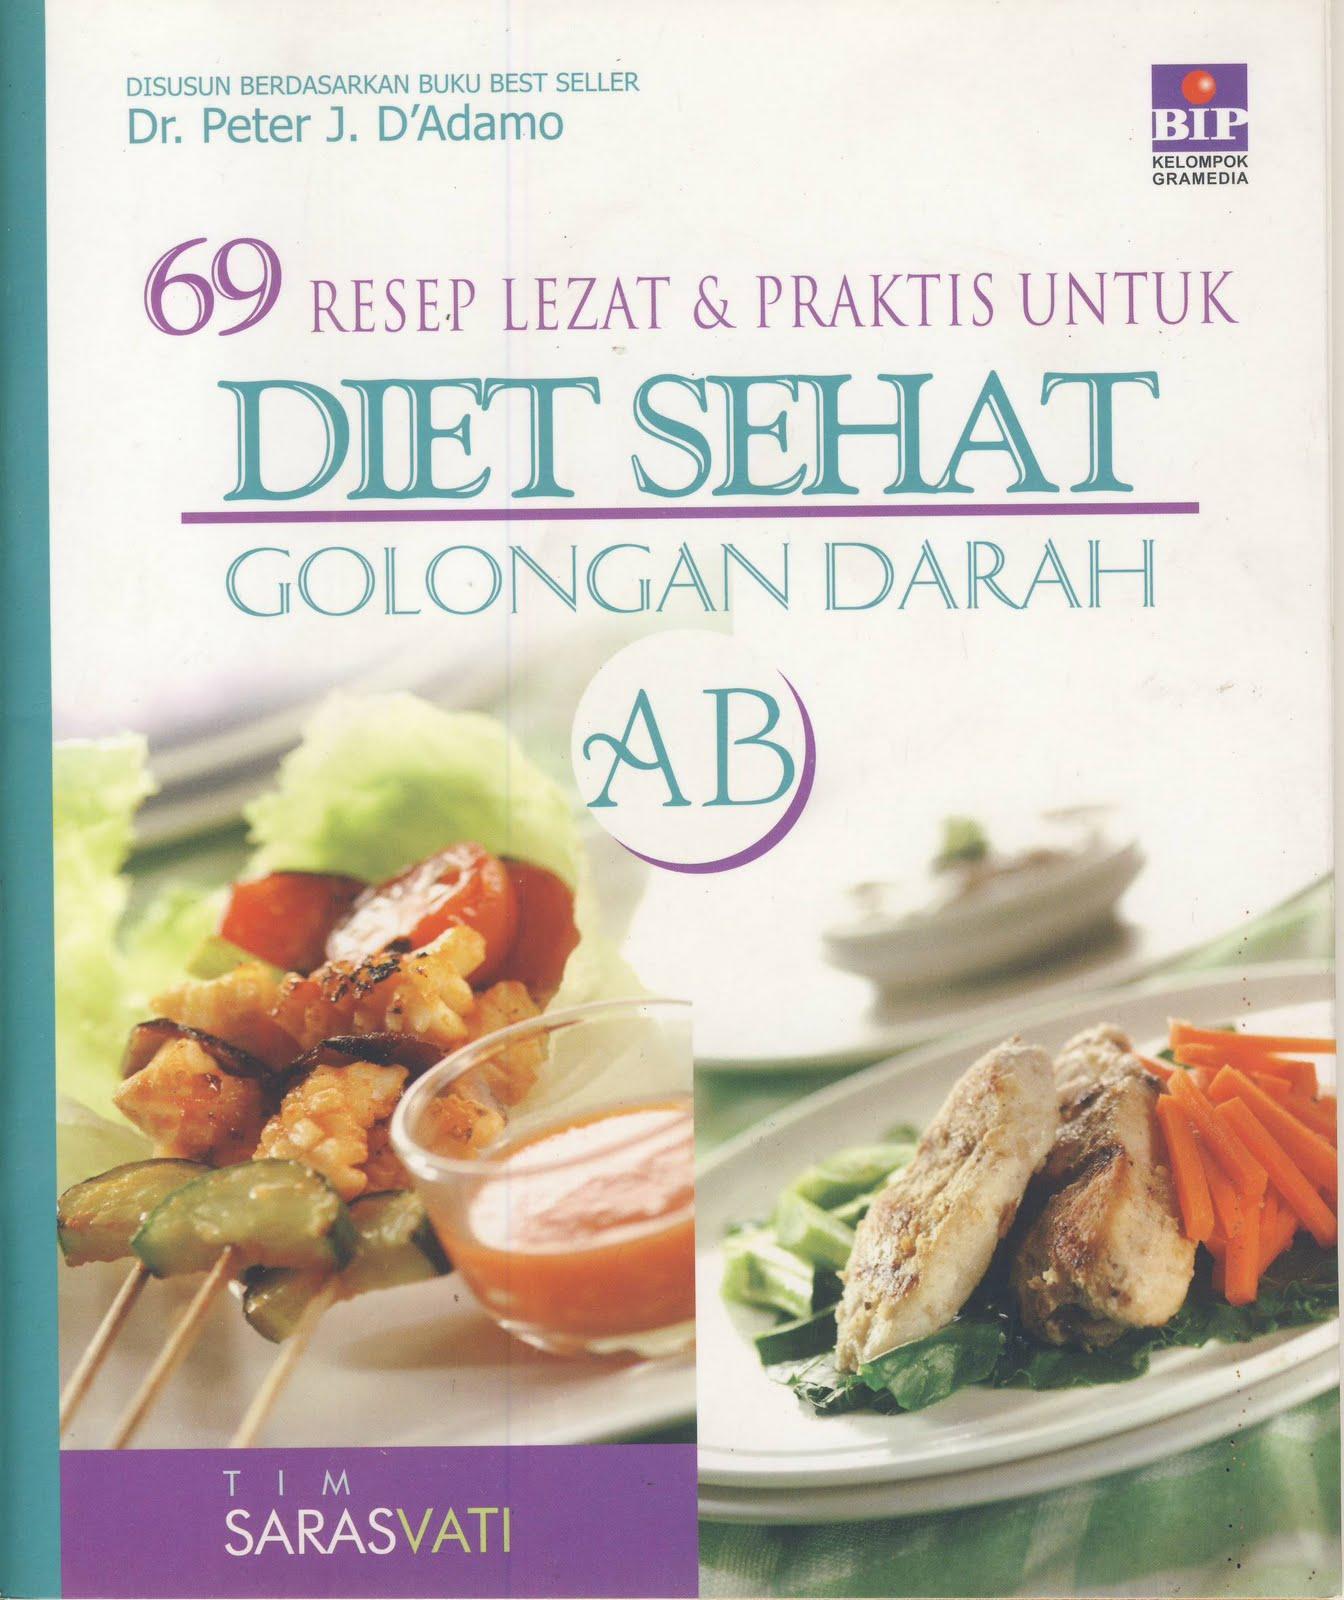 Resep Diet Golongan Darah A